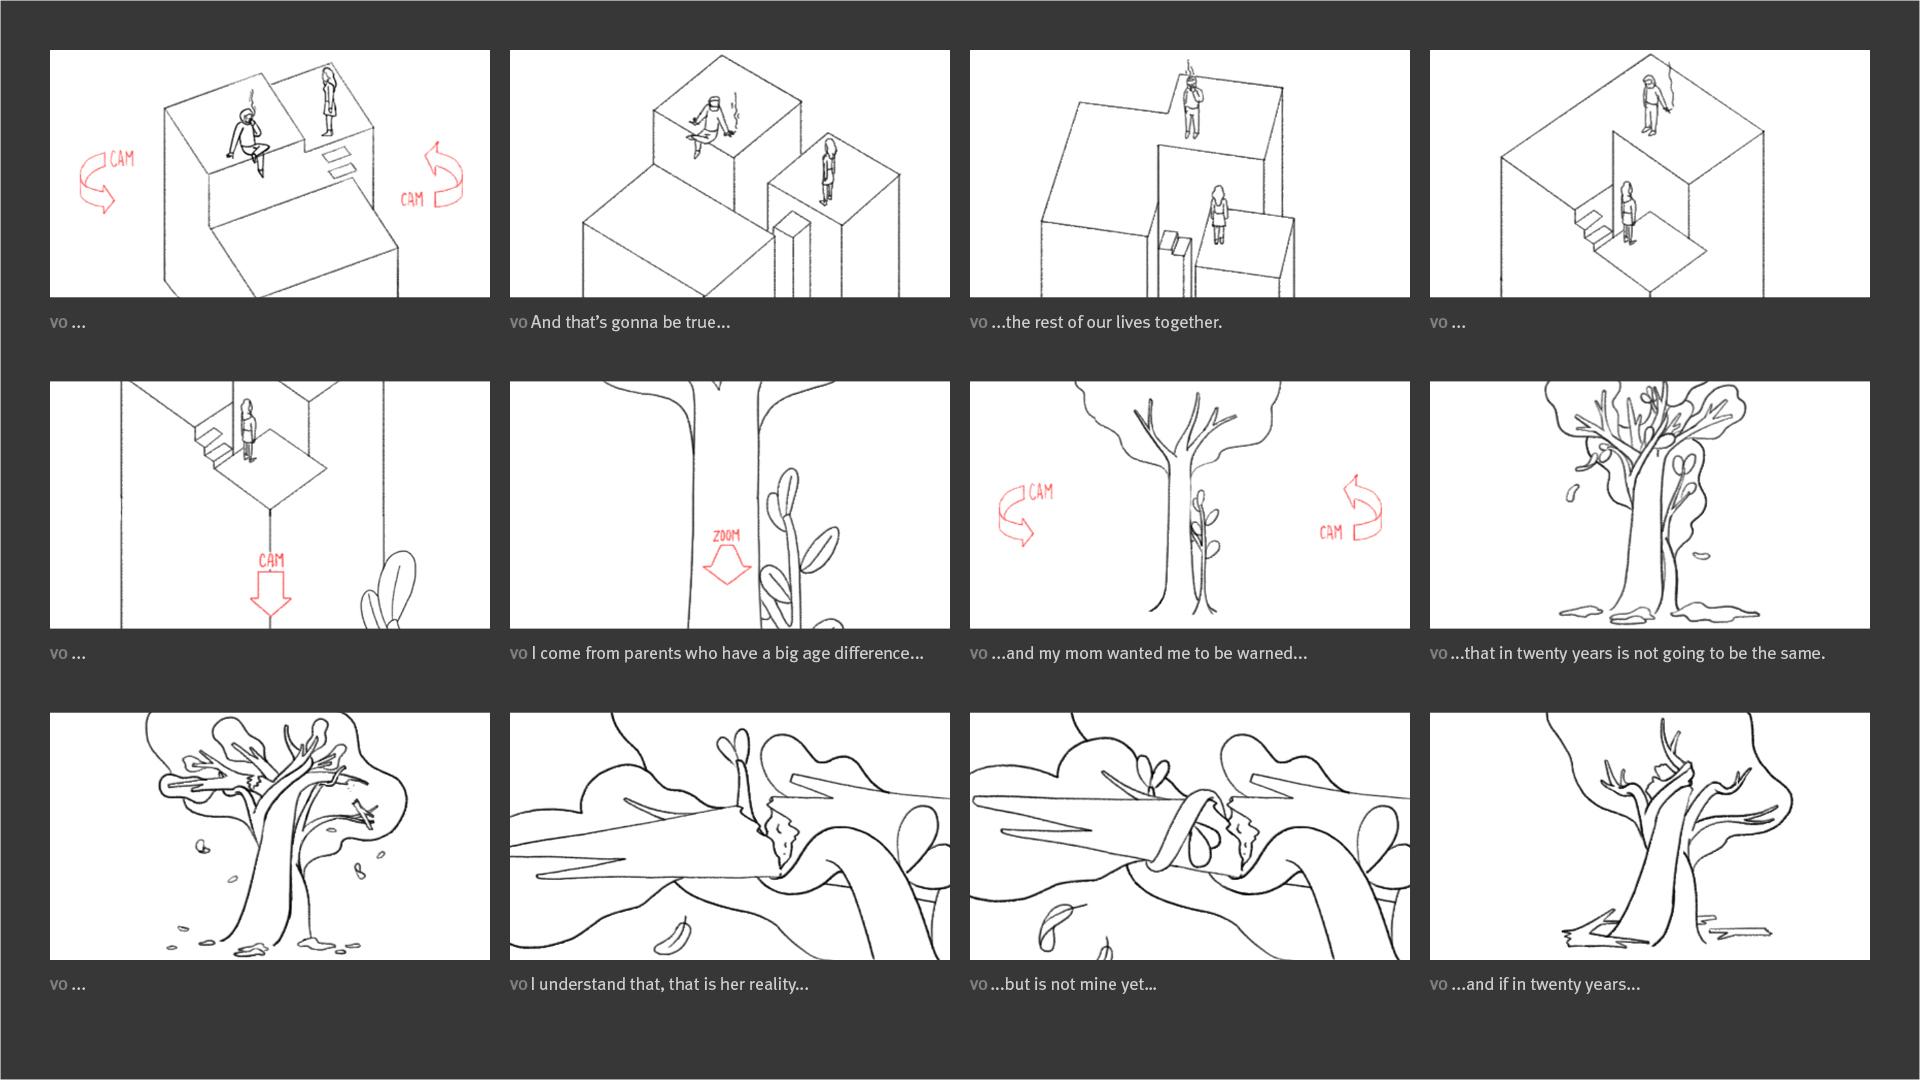 New York Times - Modern Love Storyboard 03